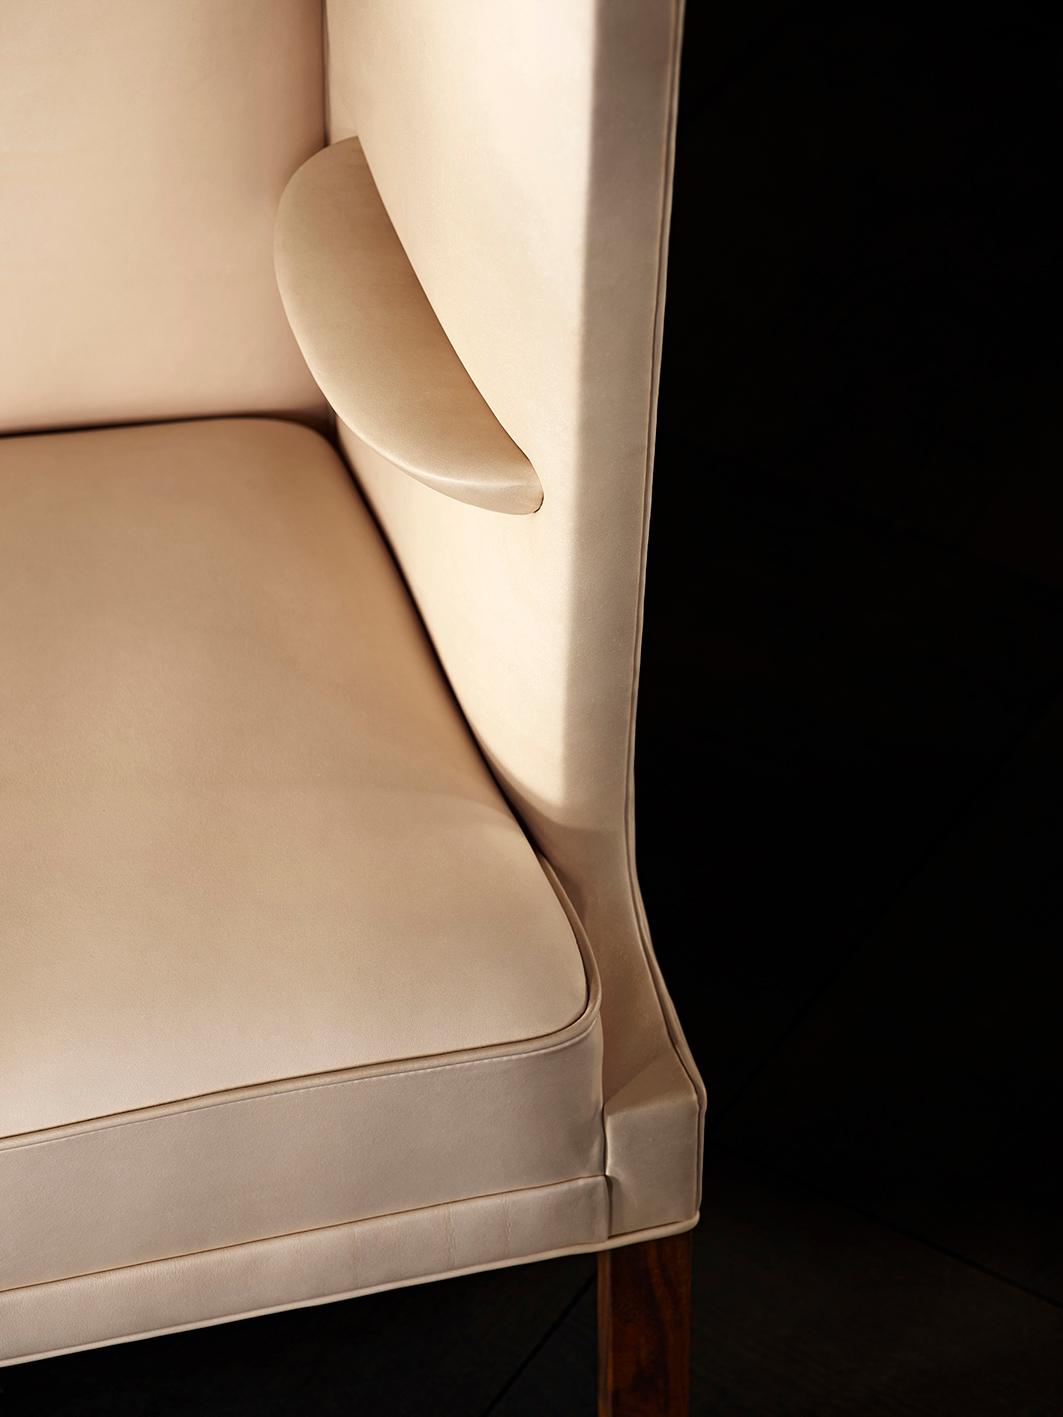 news thumb chs coupe sofa design frits henningsen 8 news thumb chs coupe sofa design frits henningsen 5